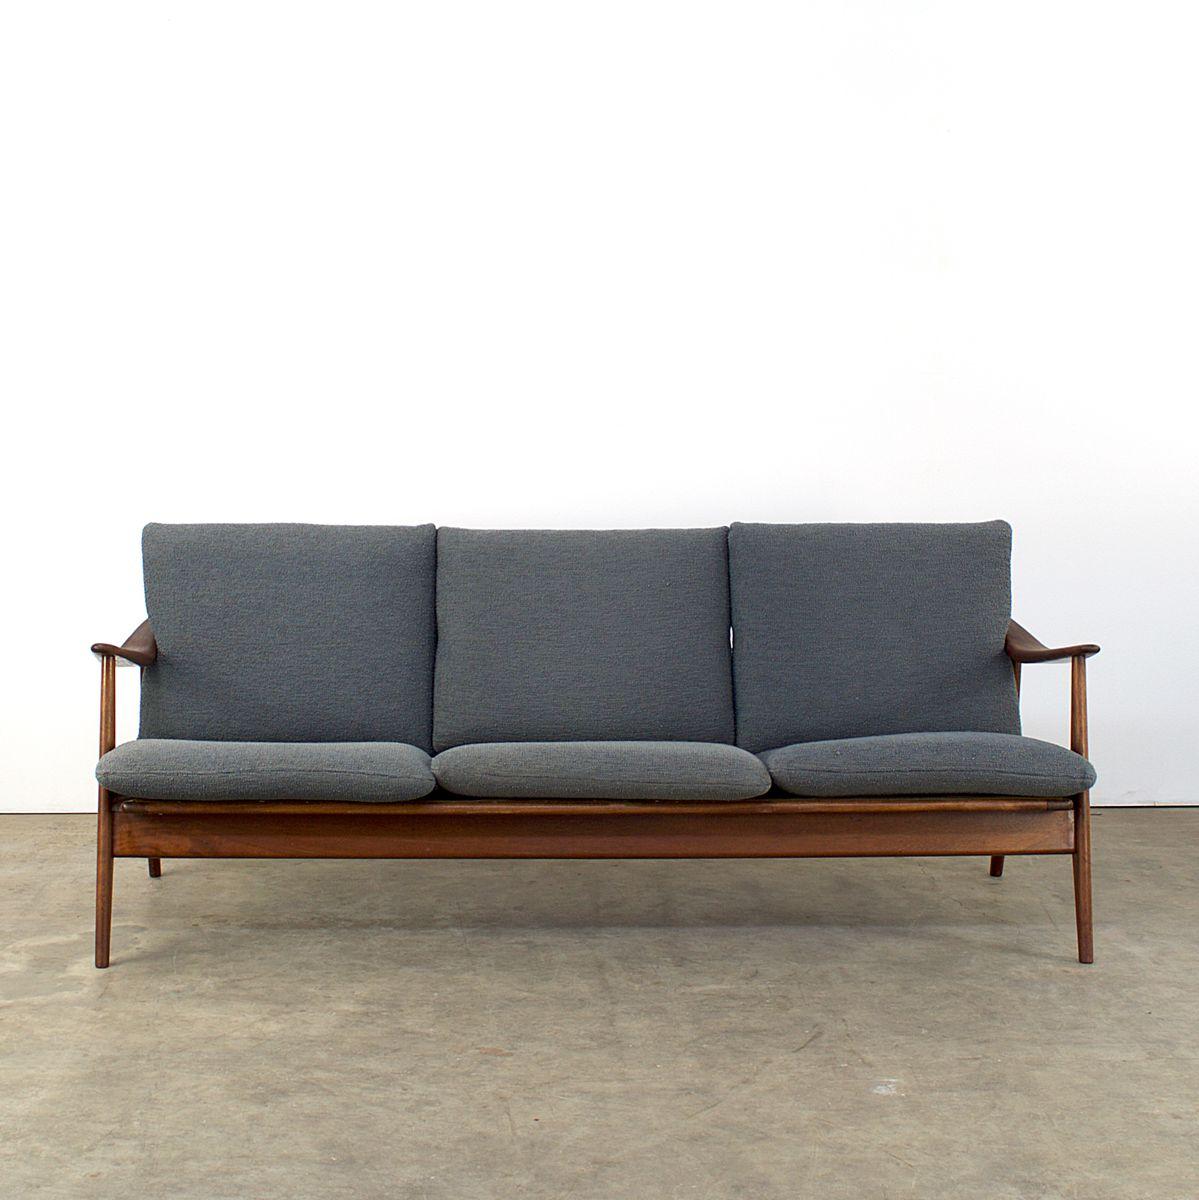 graues mid century teakholz sofa bei pamono kaufen. Black Bedroom Furniture Sets. Home Design Ideas